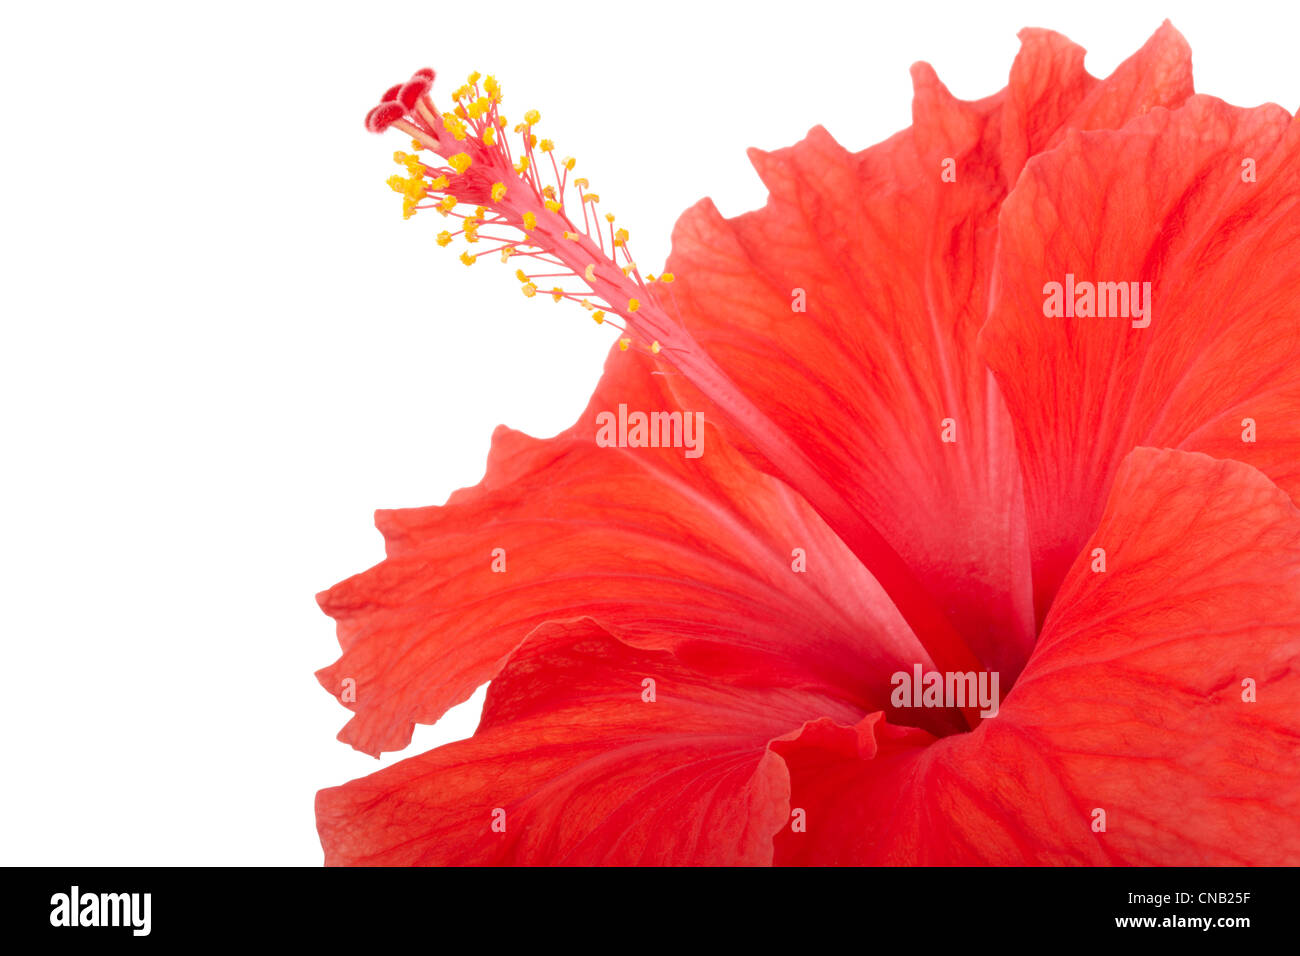 Wallpaper Of Hibiscus Stock Photos Wallpaper Of Hibiscus Stock